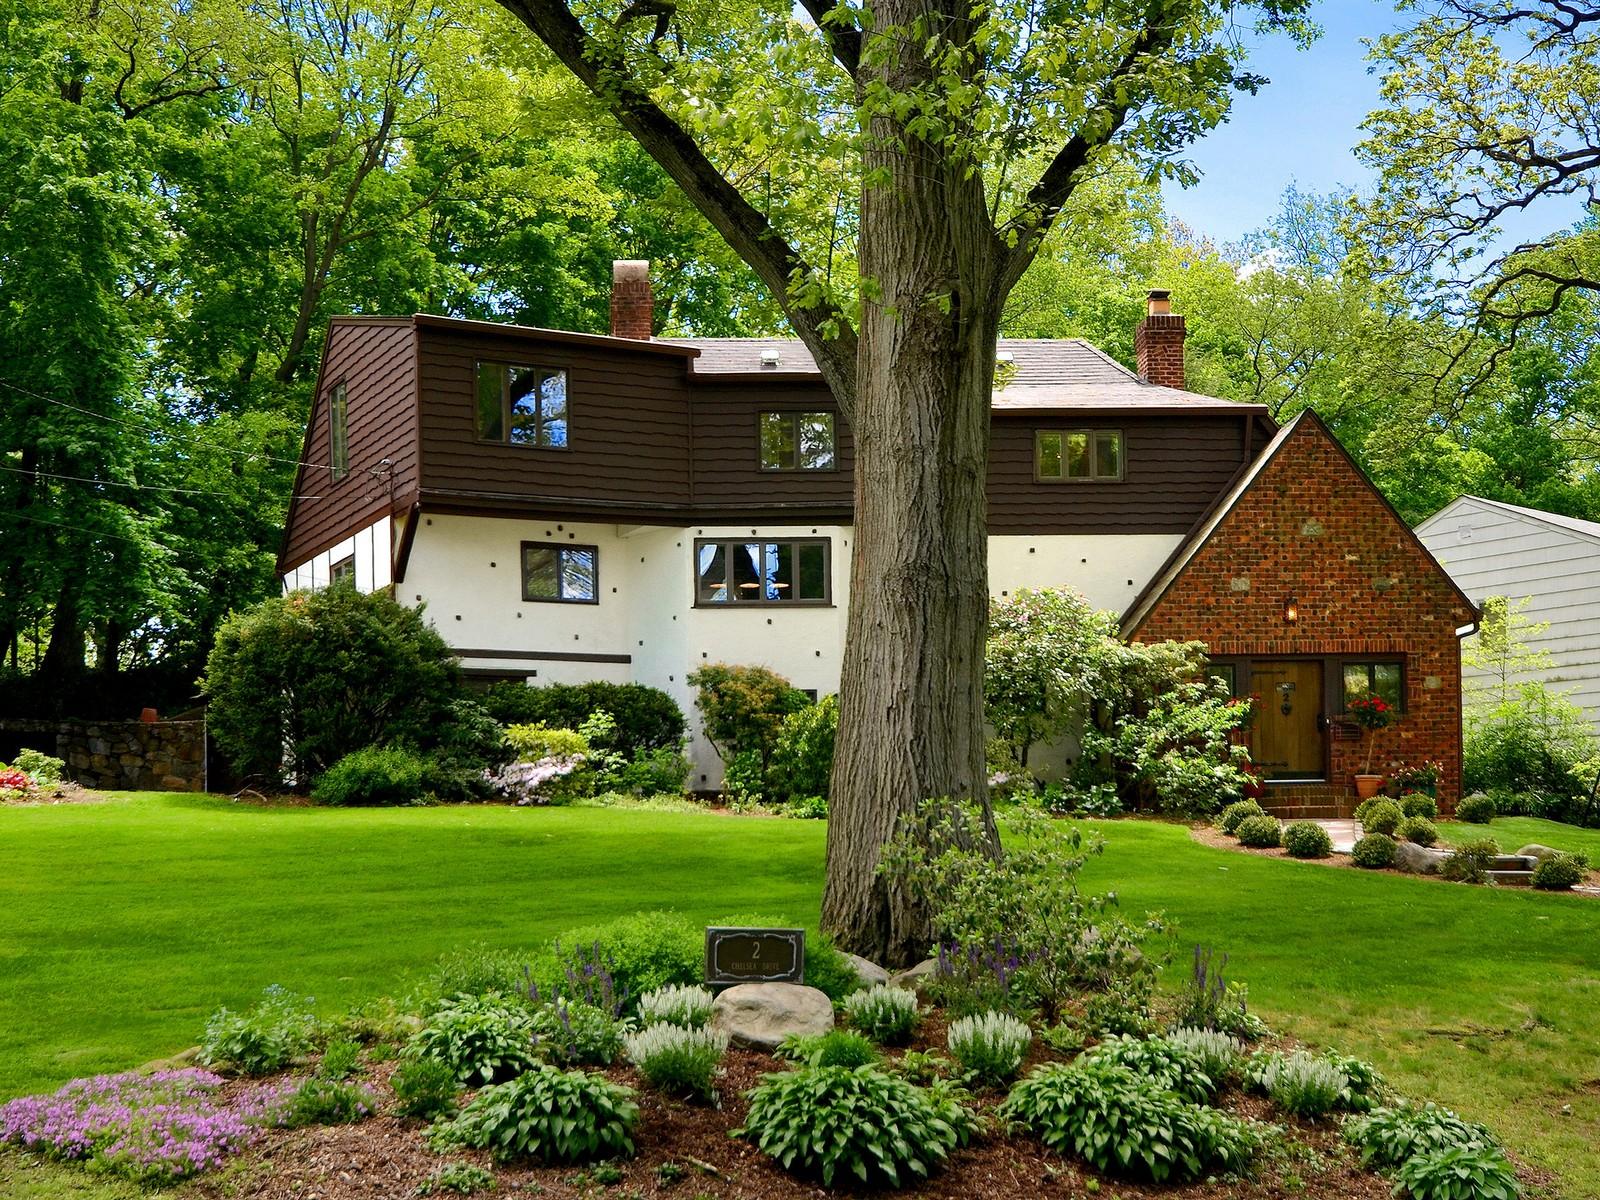 Single Family Home for Sale at Tudor 2 Chelsea Dr Port Washington, New York, 11050 United States